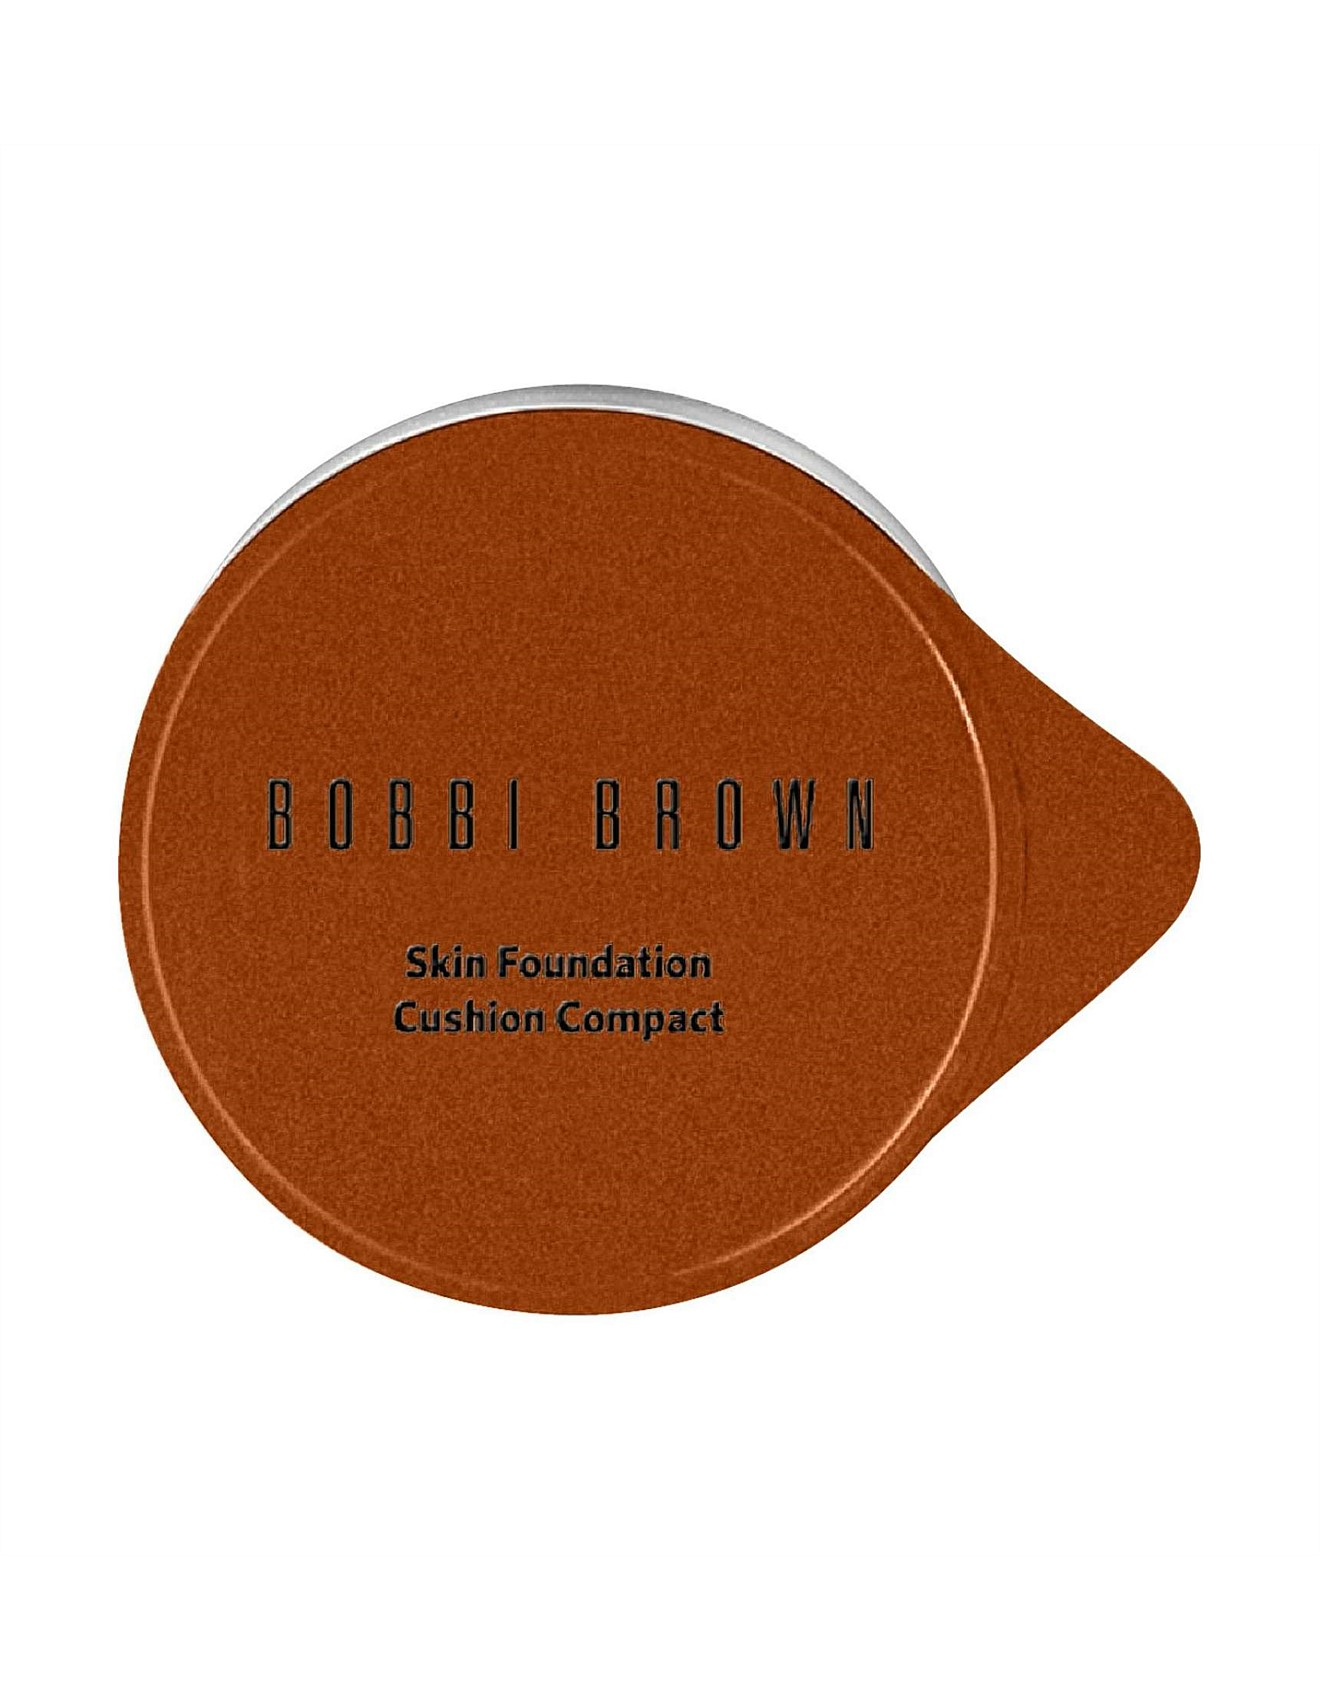 Skin Foundation Cushion Compact Refill